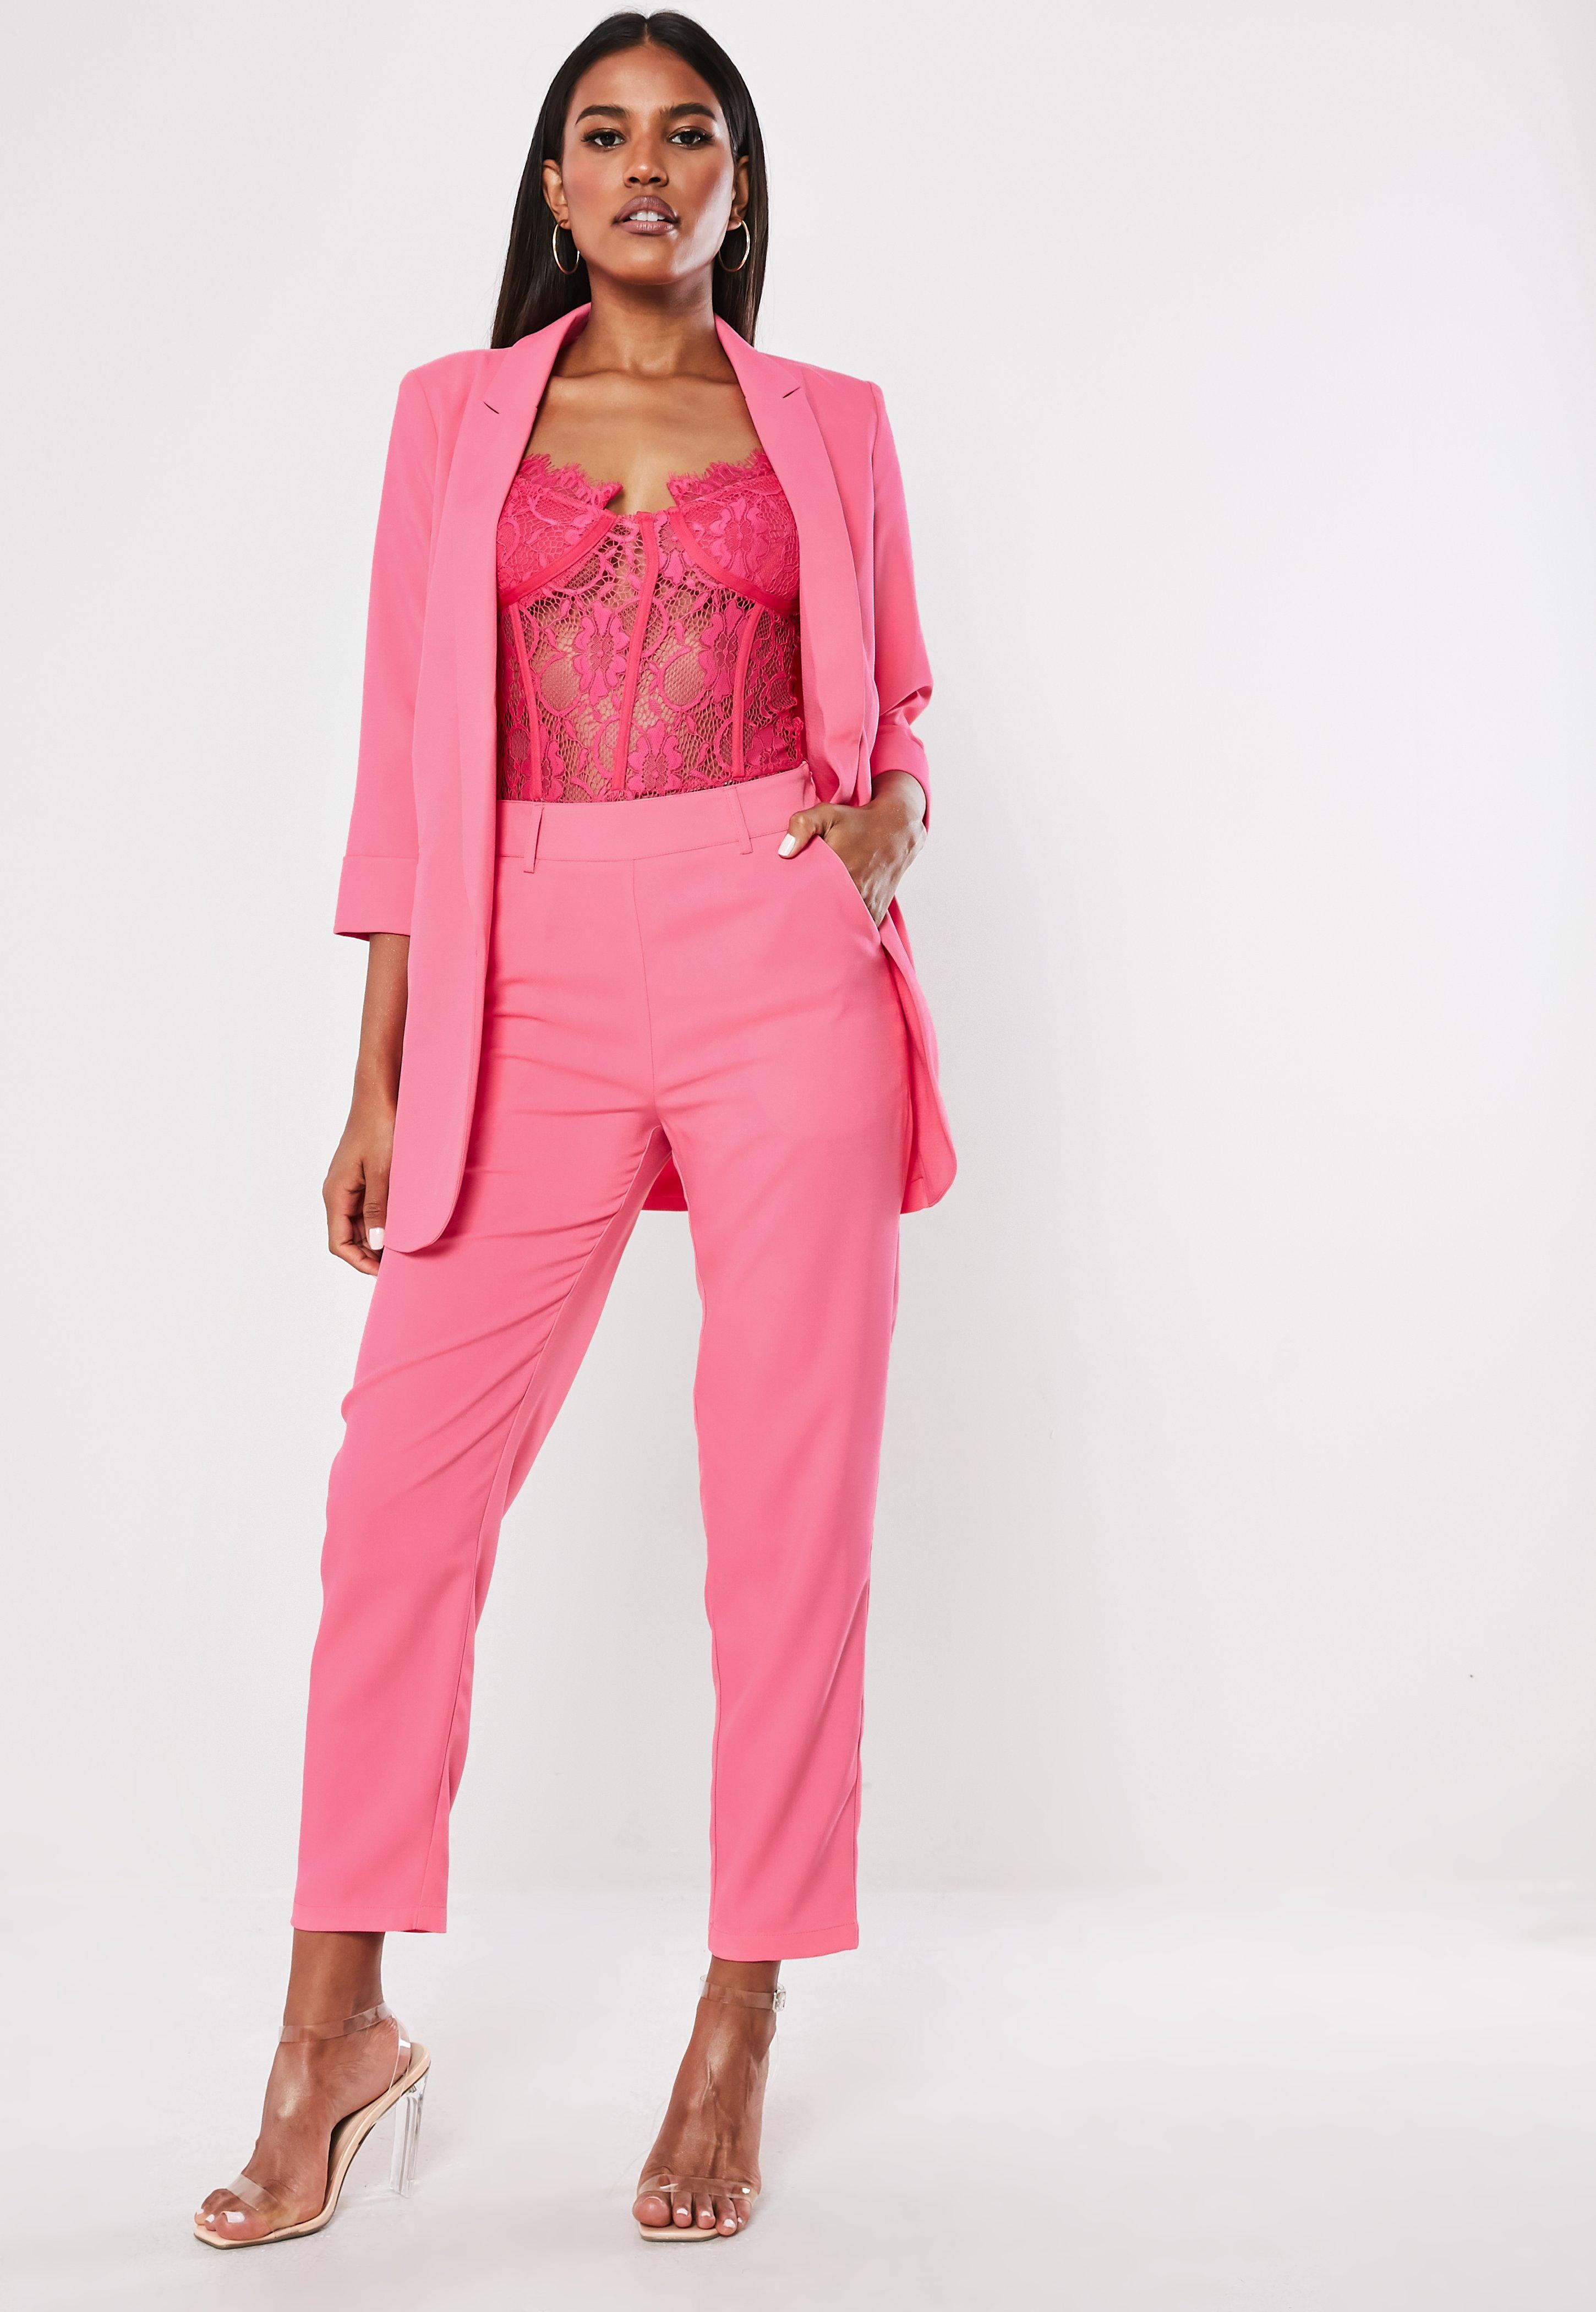 fb3ed0f1592cde Pants, Shop Women's Pants Online - Missguided Australia